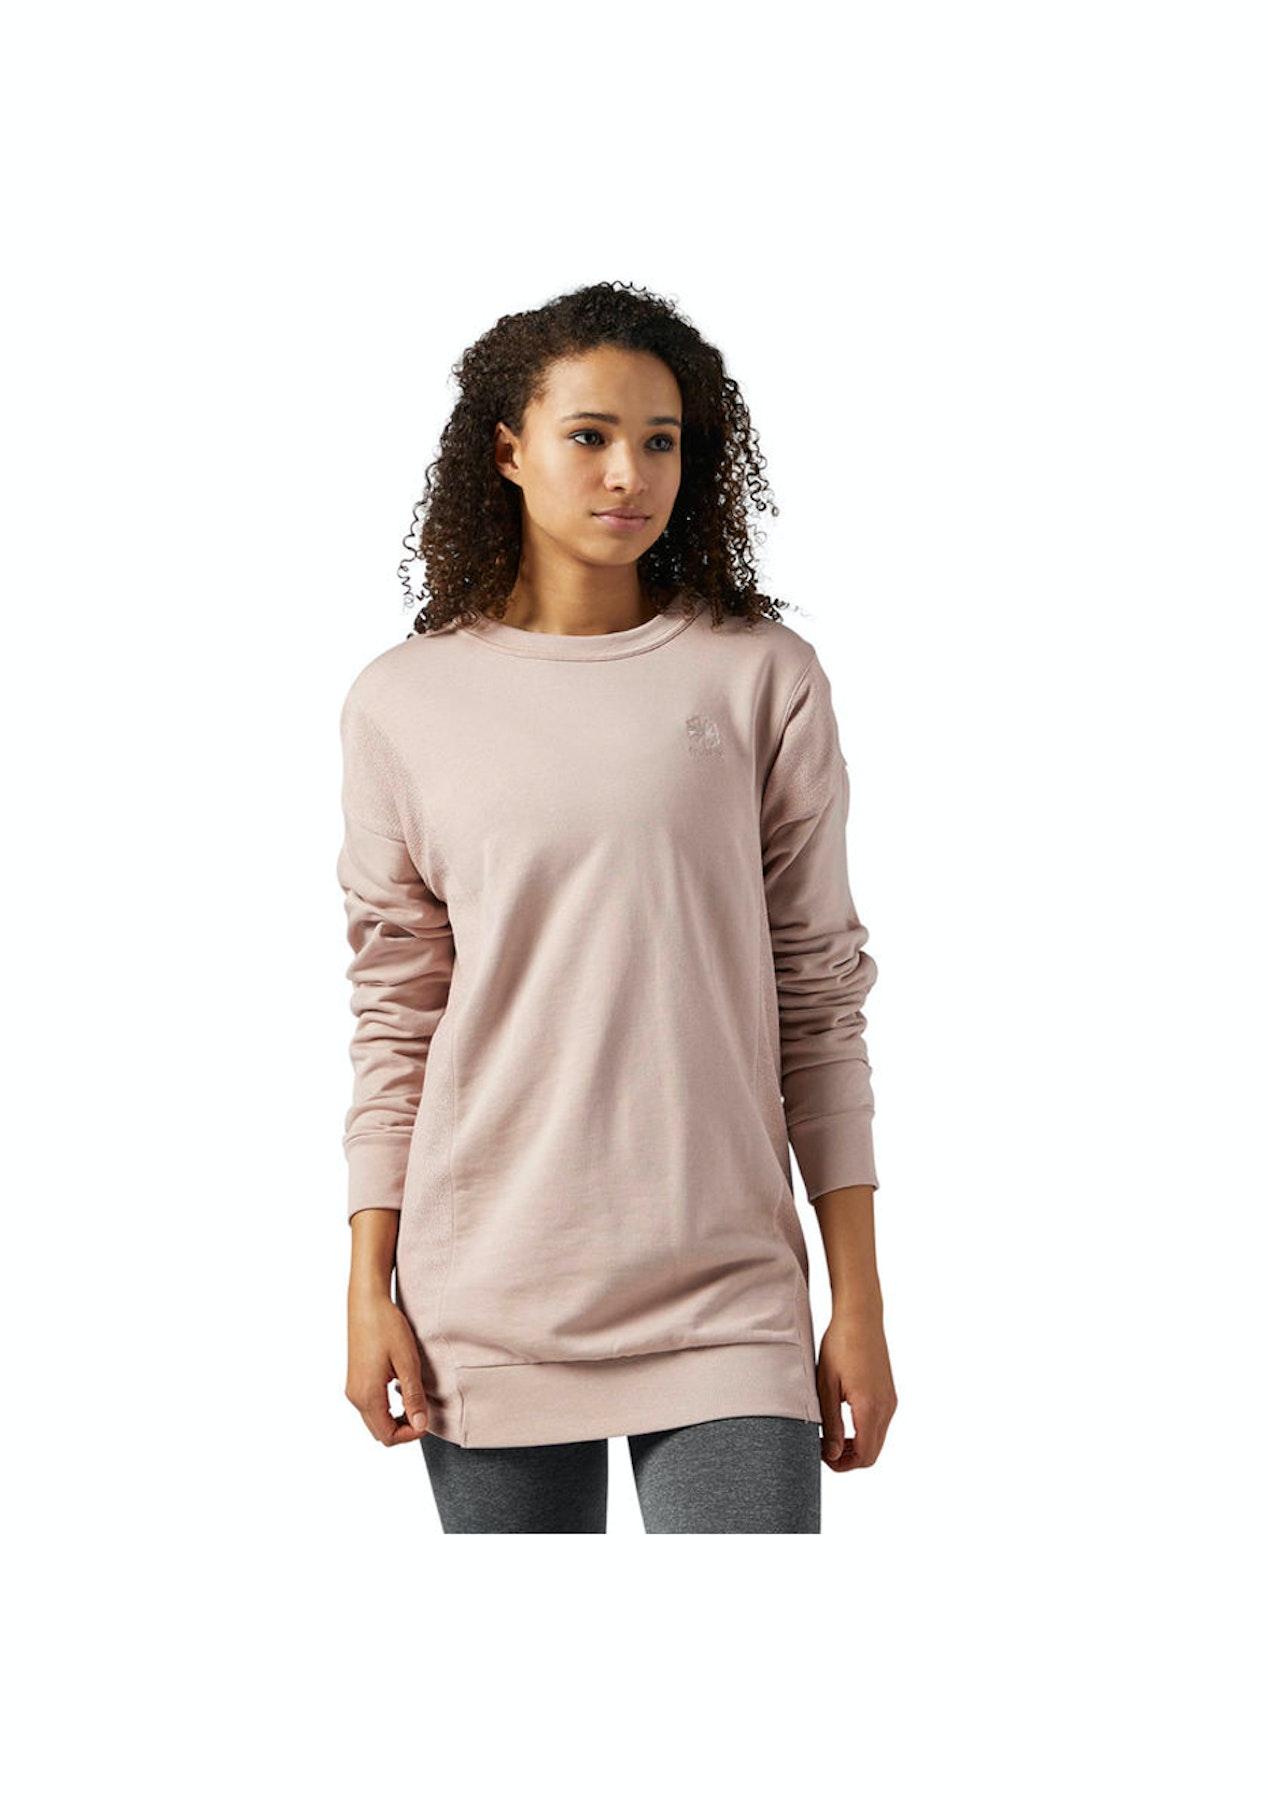 76237b6f Reebok Womens - French Terry Crewneck Sweatshirt Shell Pink - Puma & Reebok  Reductions - Onceit